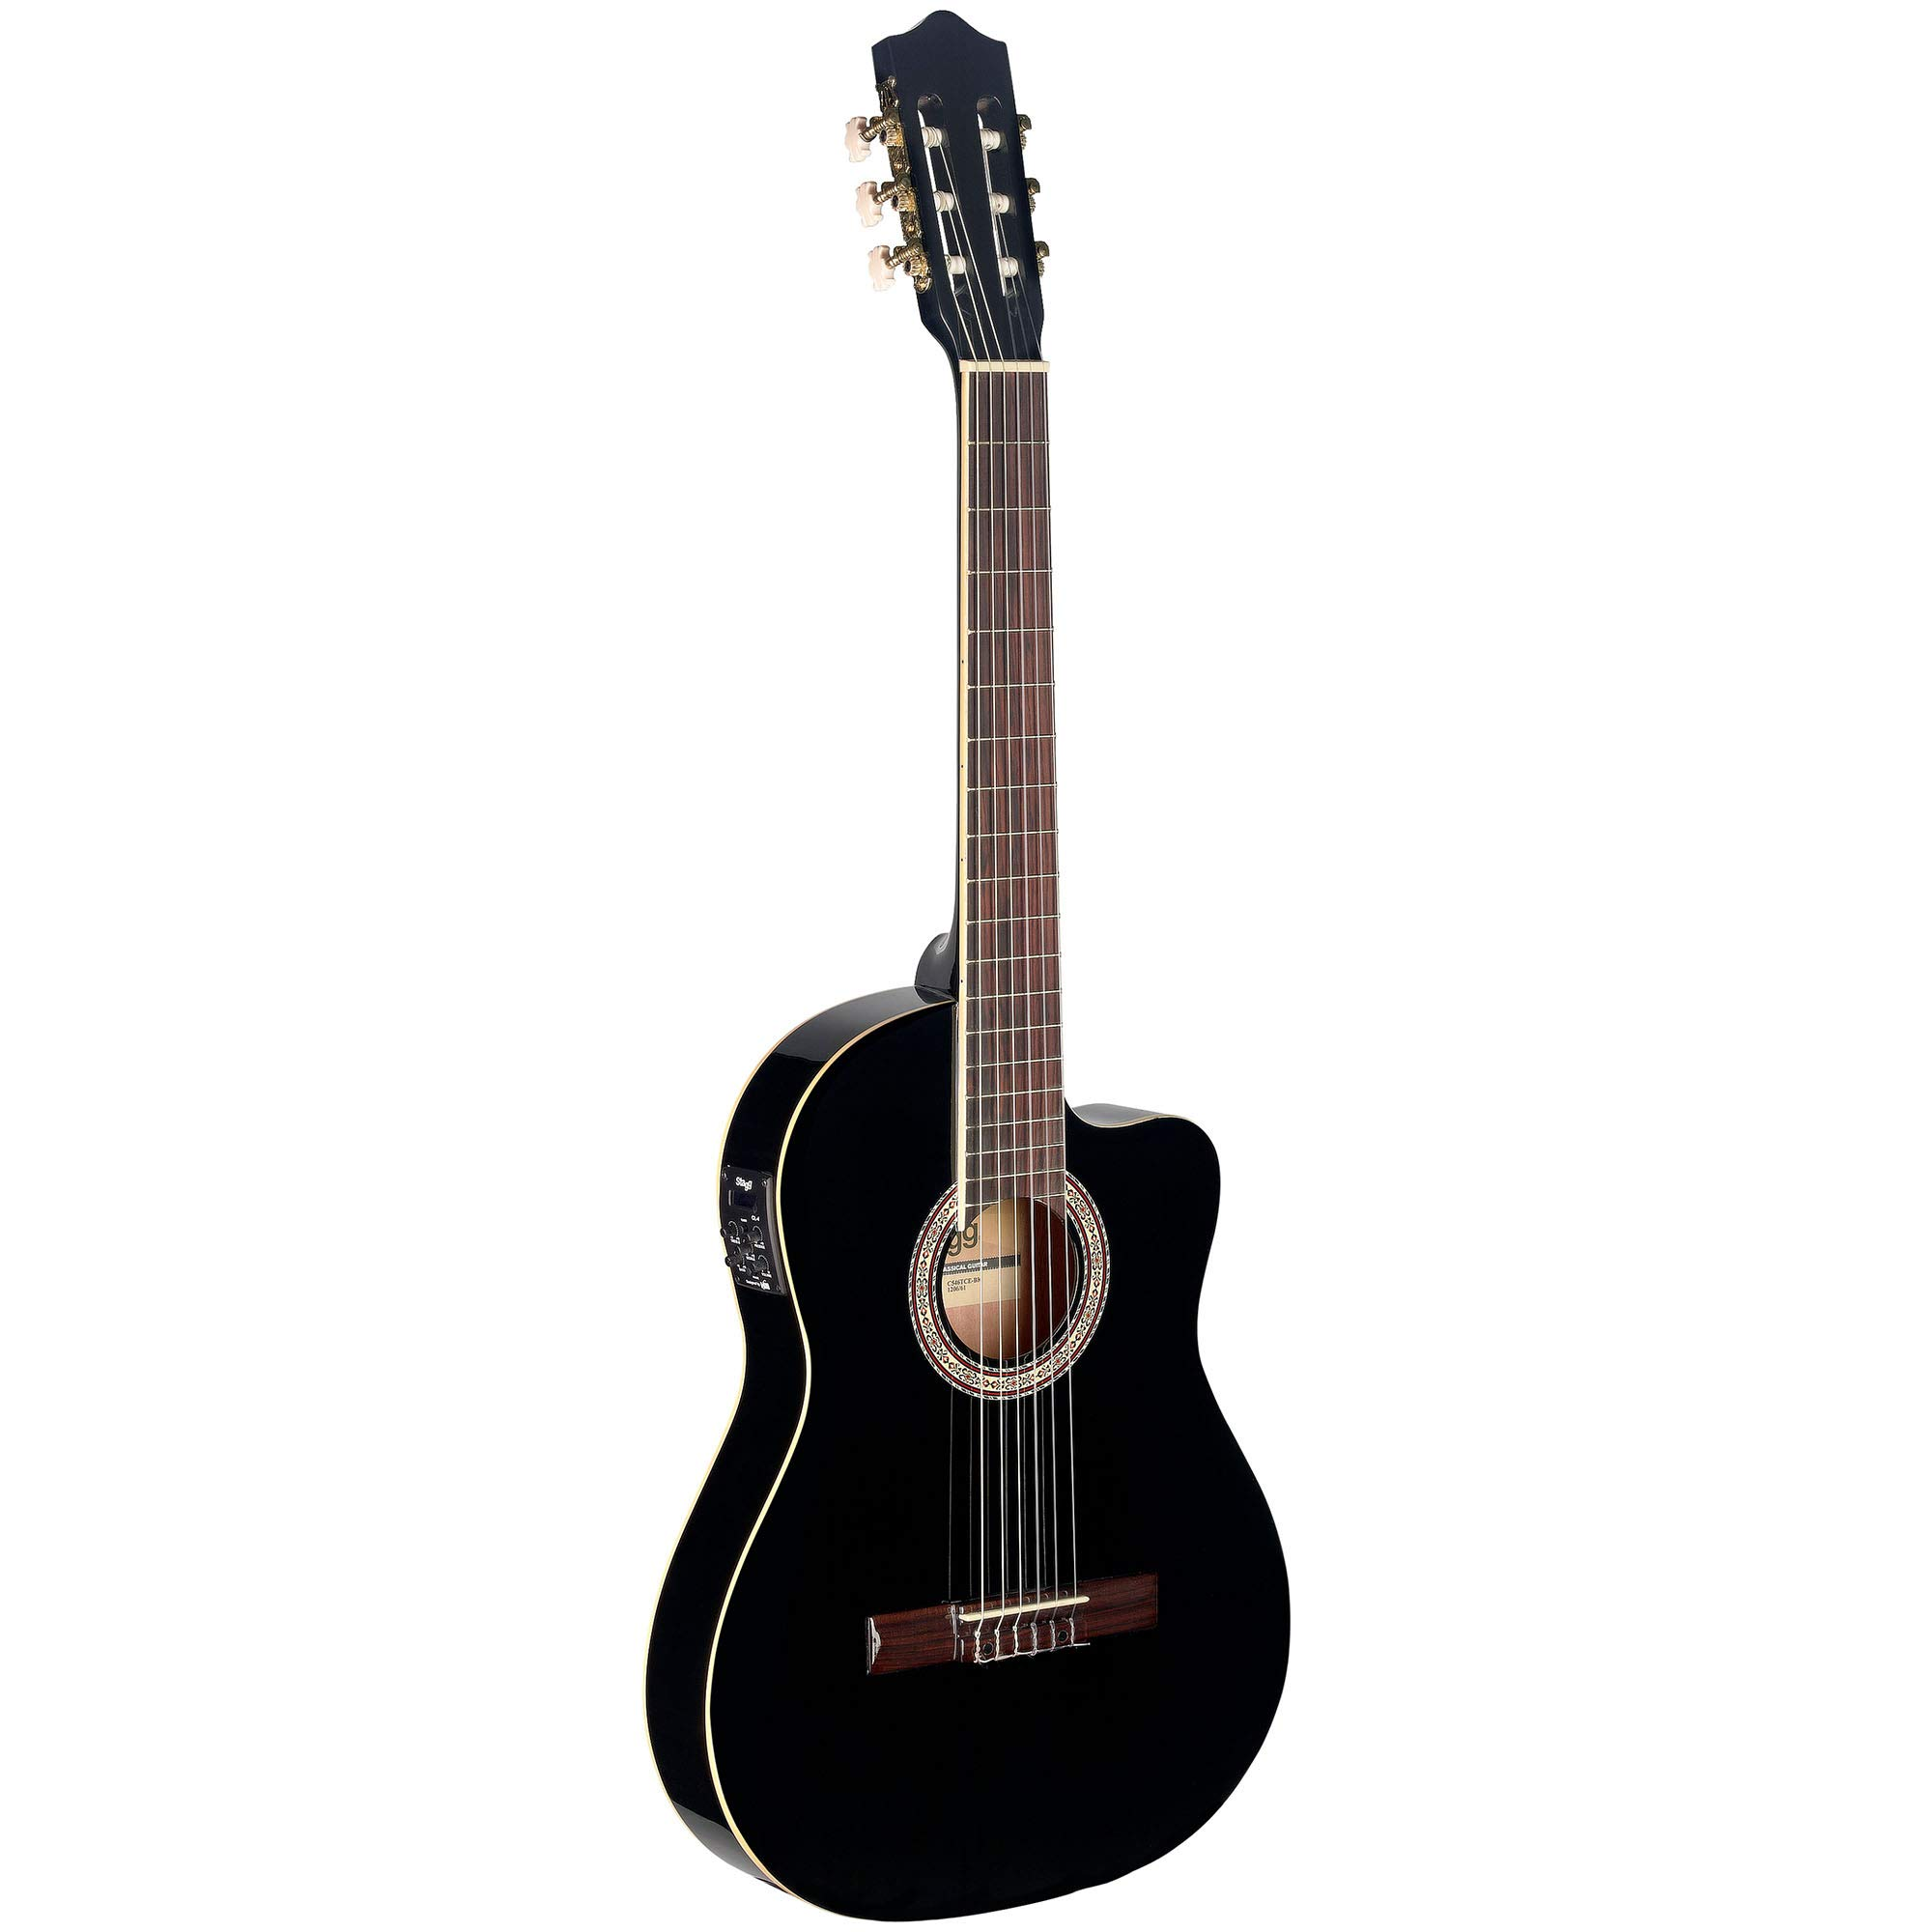 Stagg Electroacústica C546TCE BK guitarra clásica - negro product image